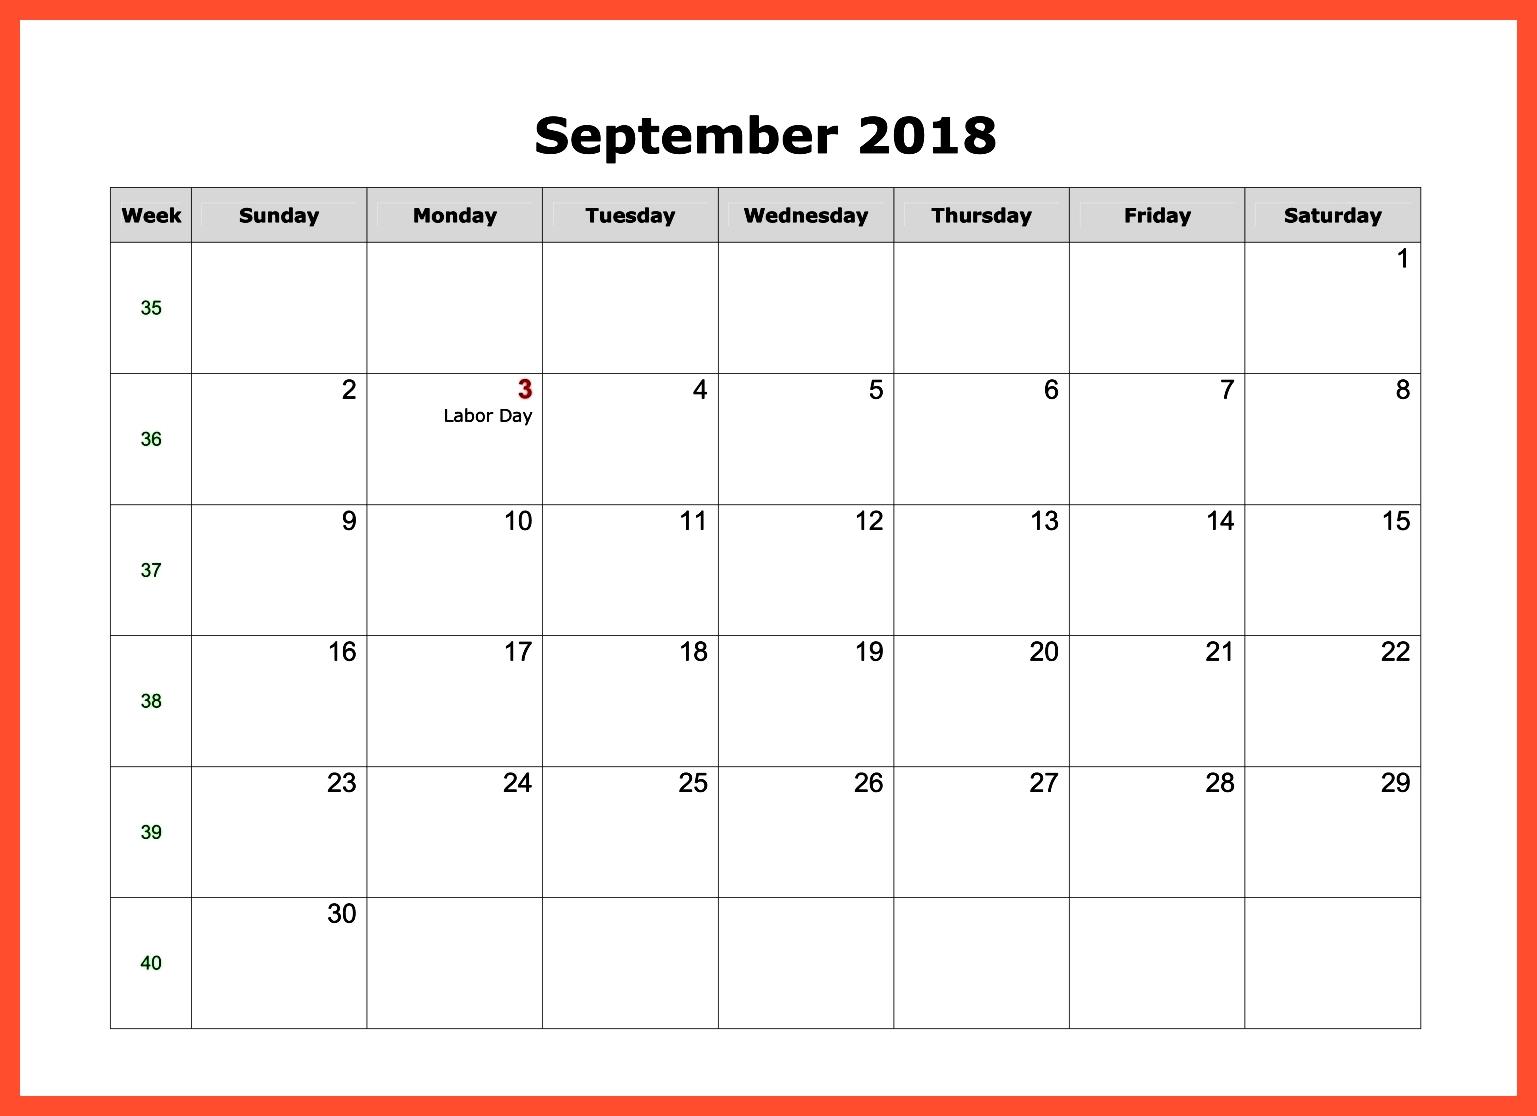 September 2018 Calendar PDF